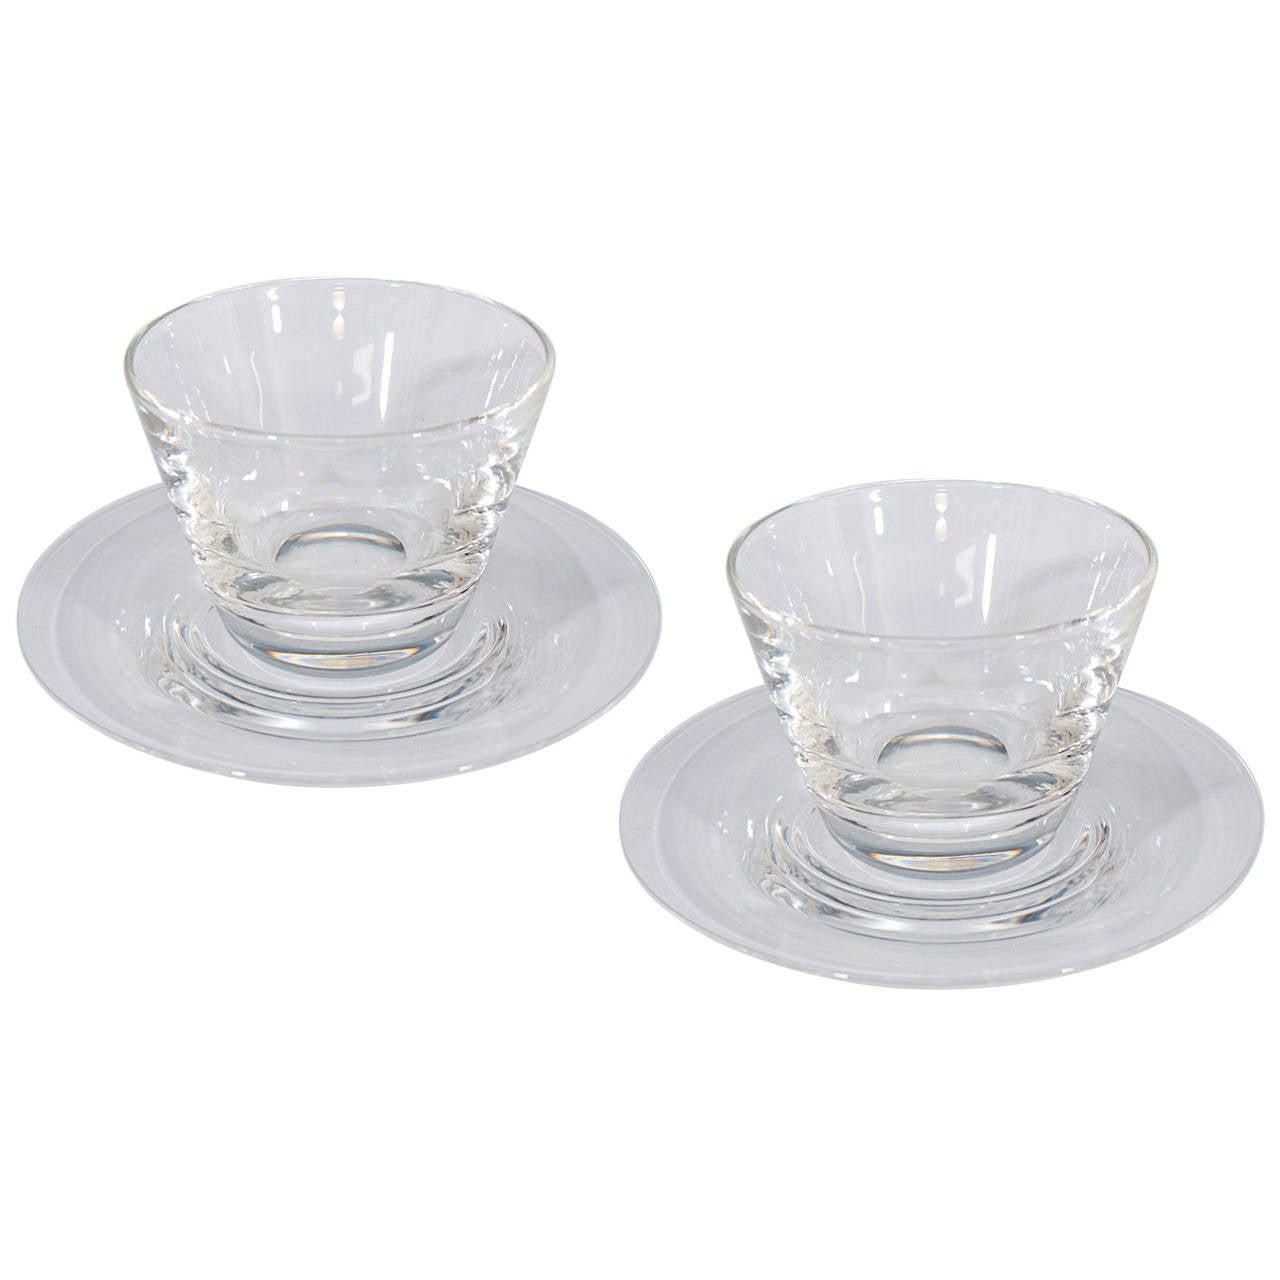 Set of 12 steuben glass finger bowls and underplates for sale at set of 12 steuben glass finger bowls and underplates for sale reviewsmspy